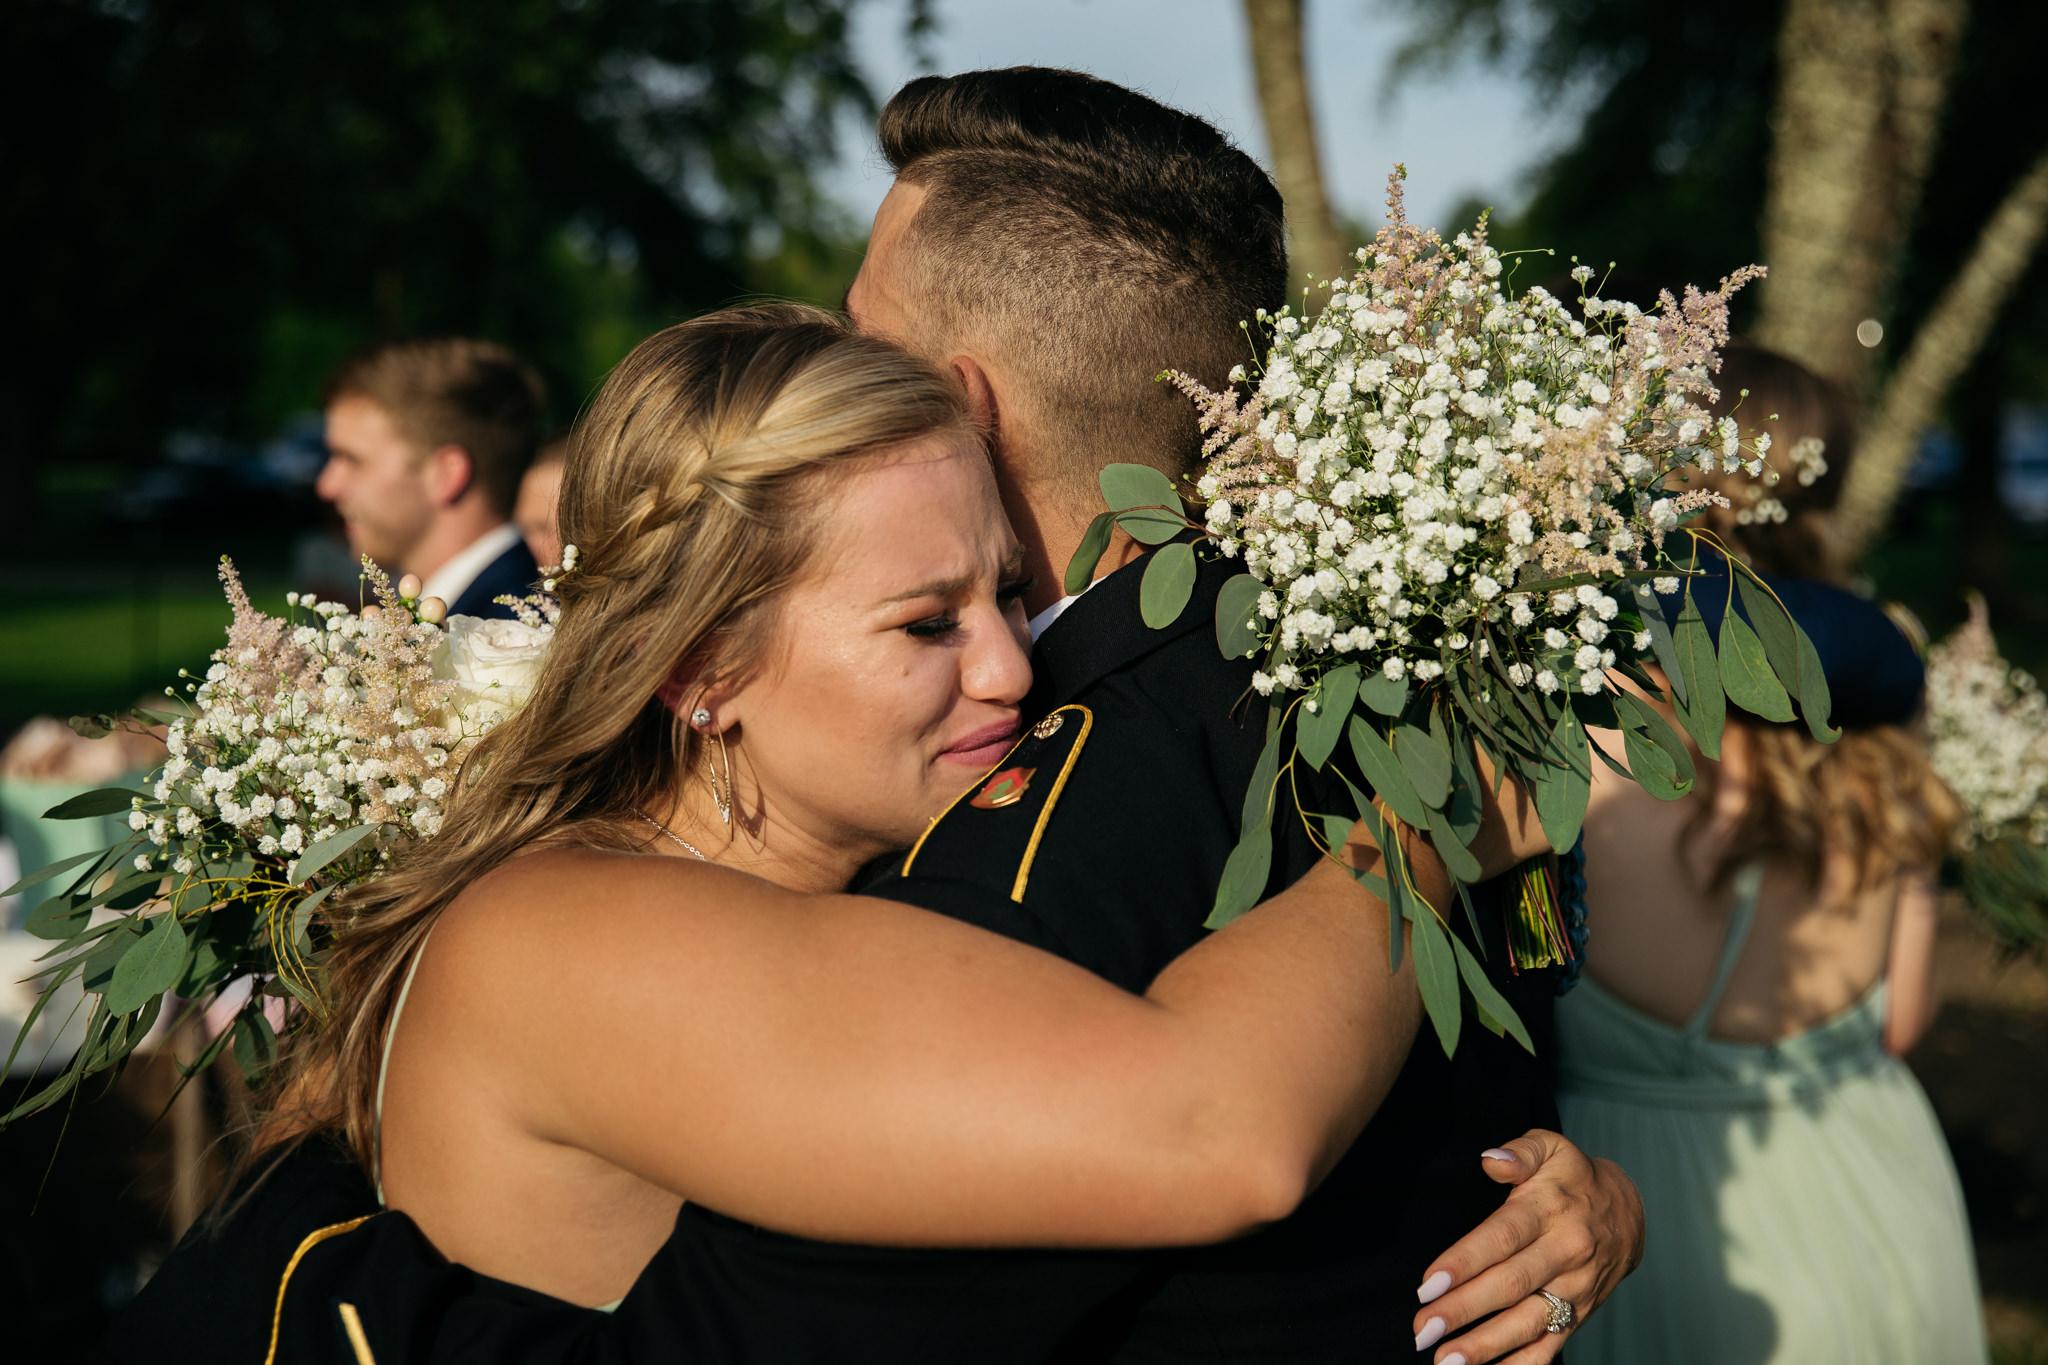 backyard-wedding-thewarmtharoundyou-lexy-branson-59.jpg